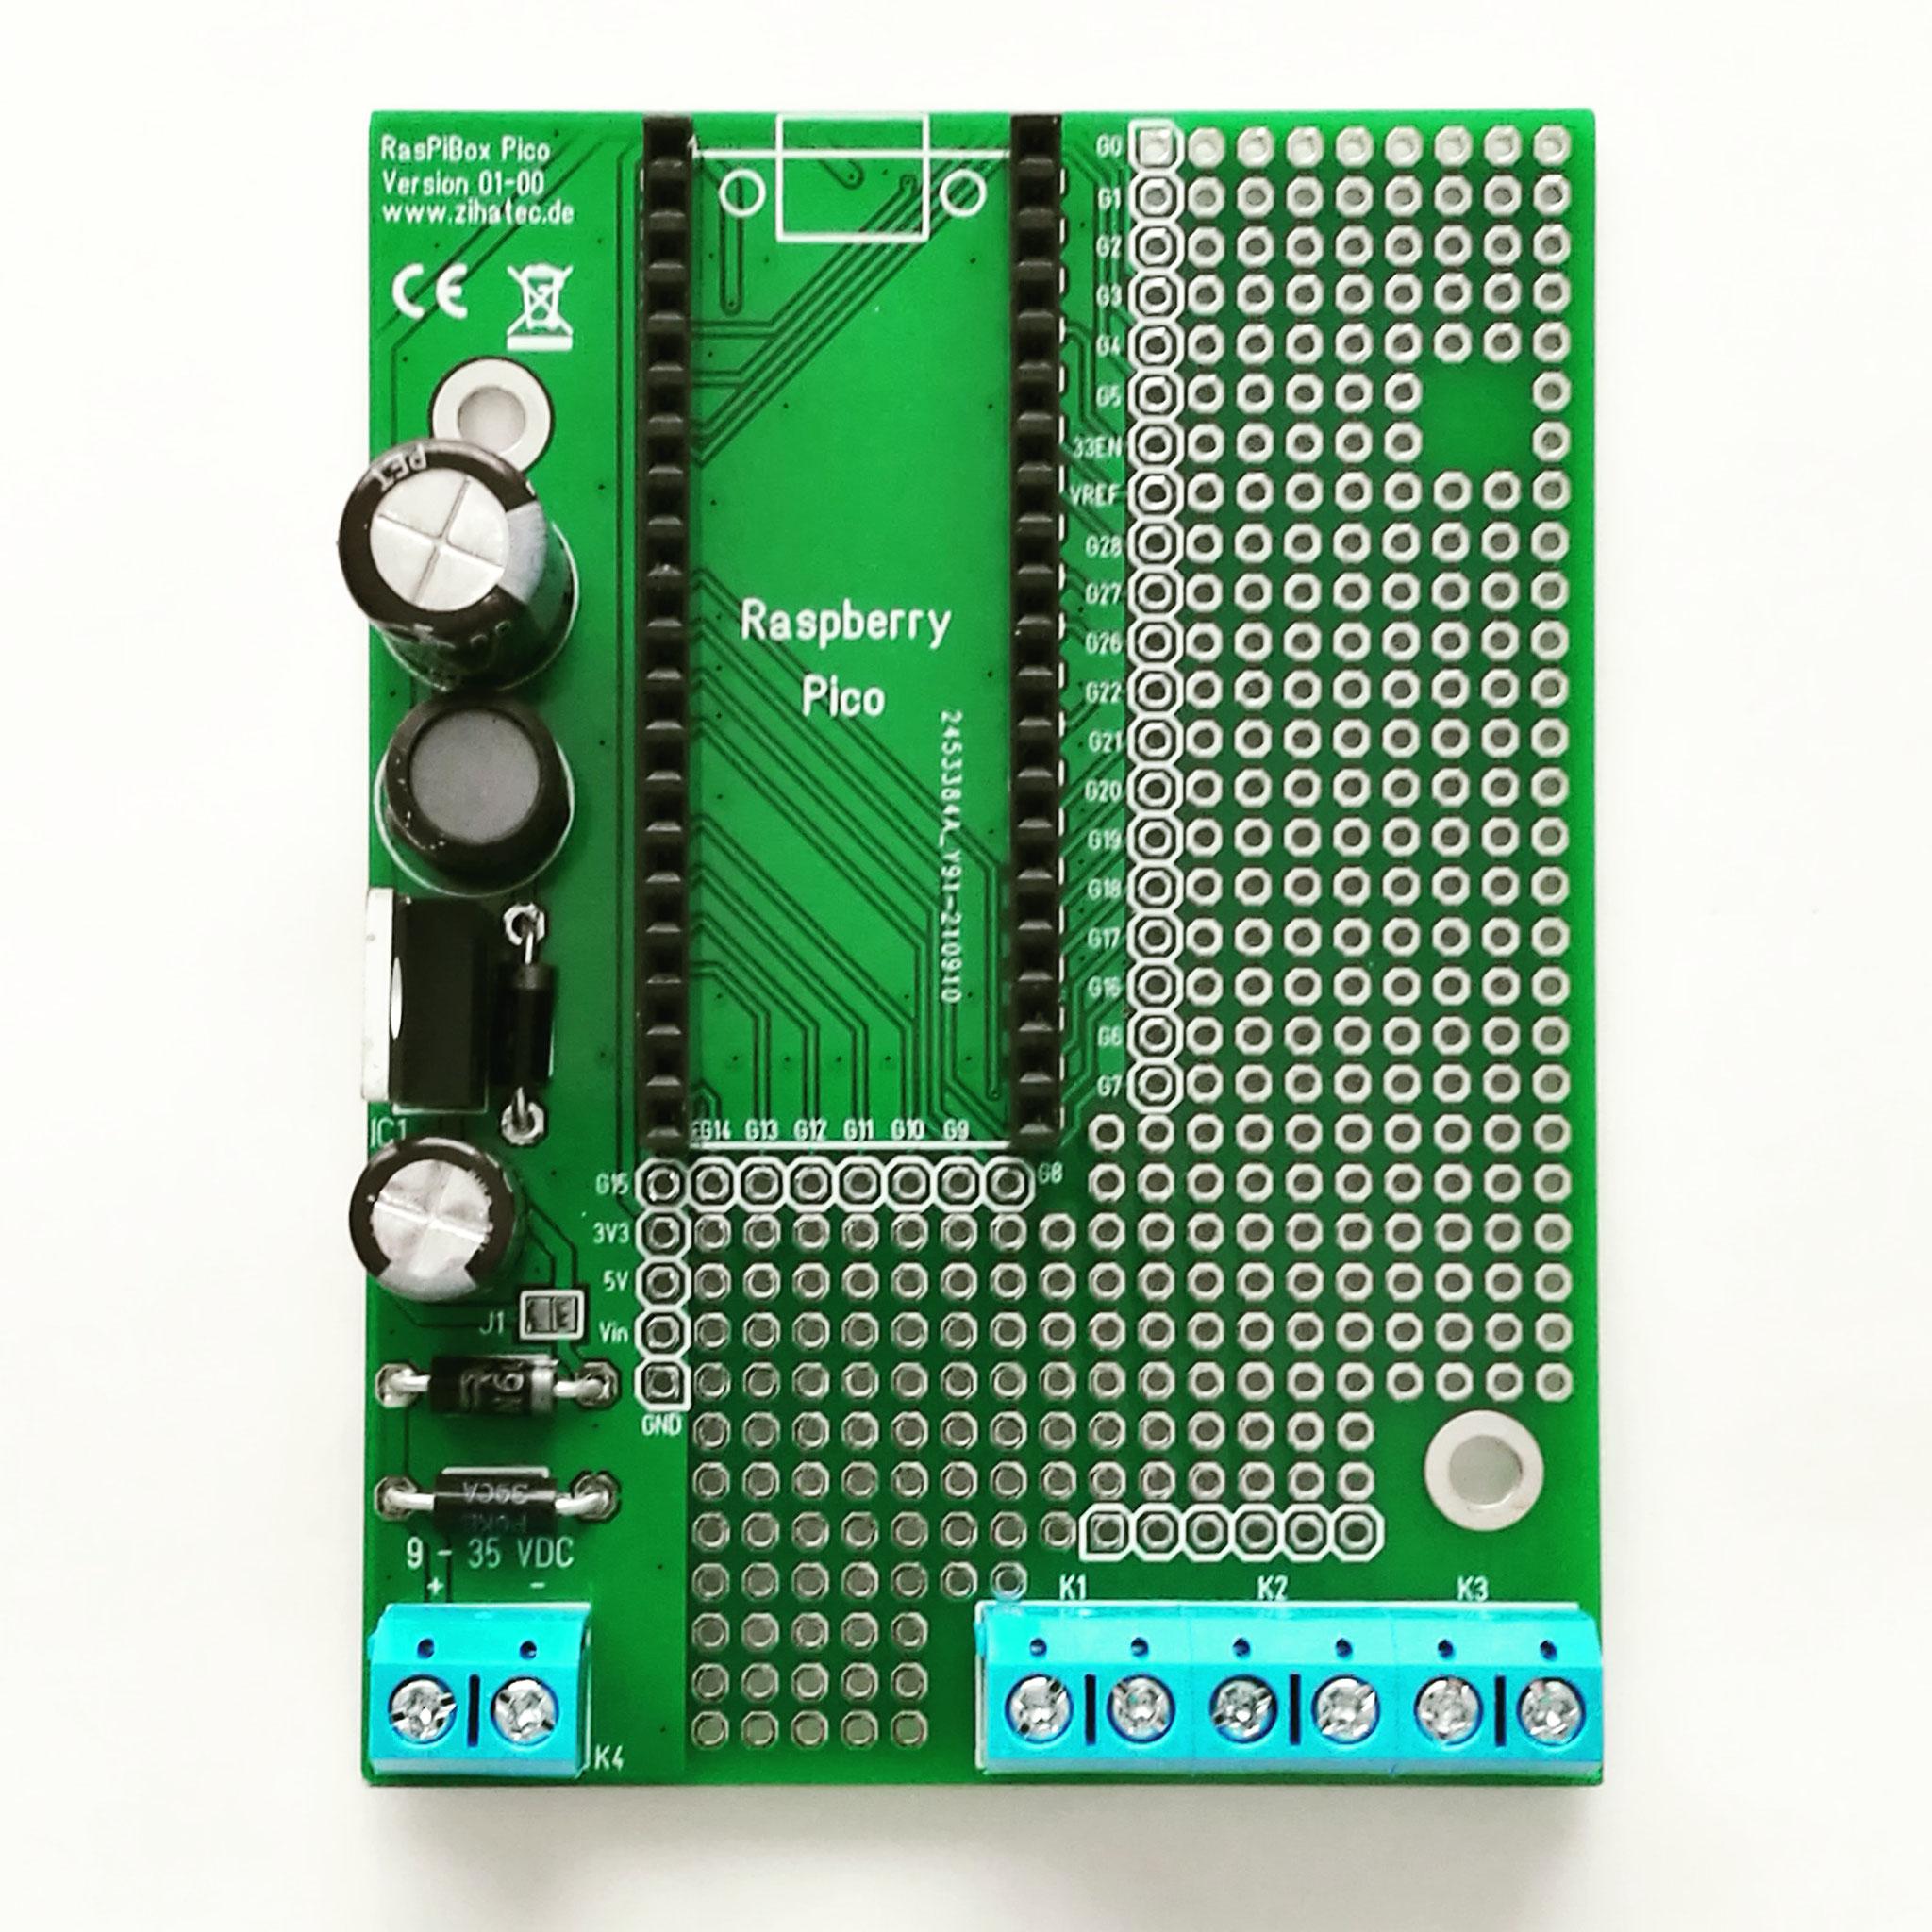 Assembled RasPiBox Pico PCB